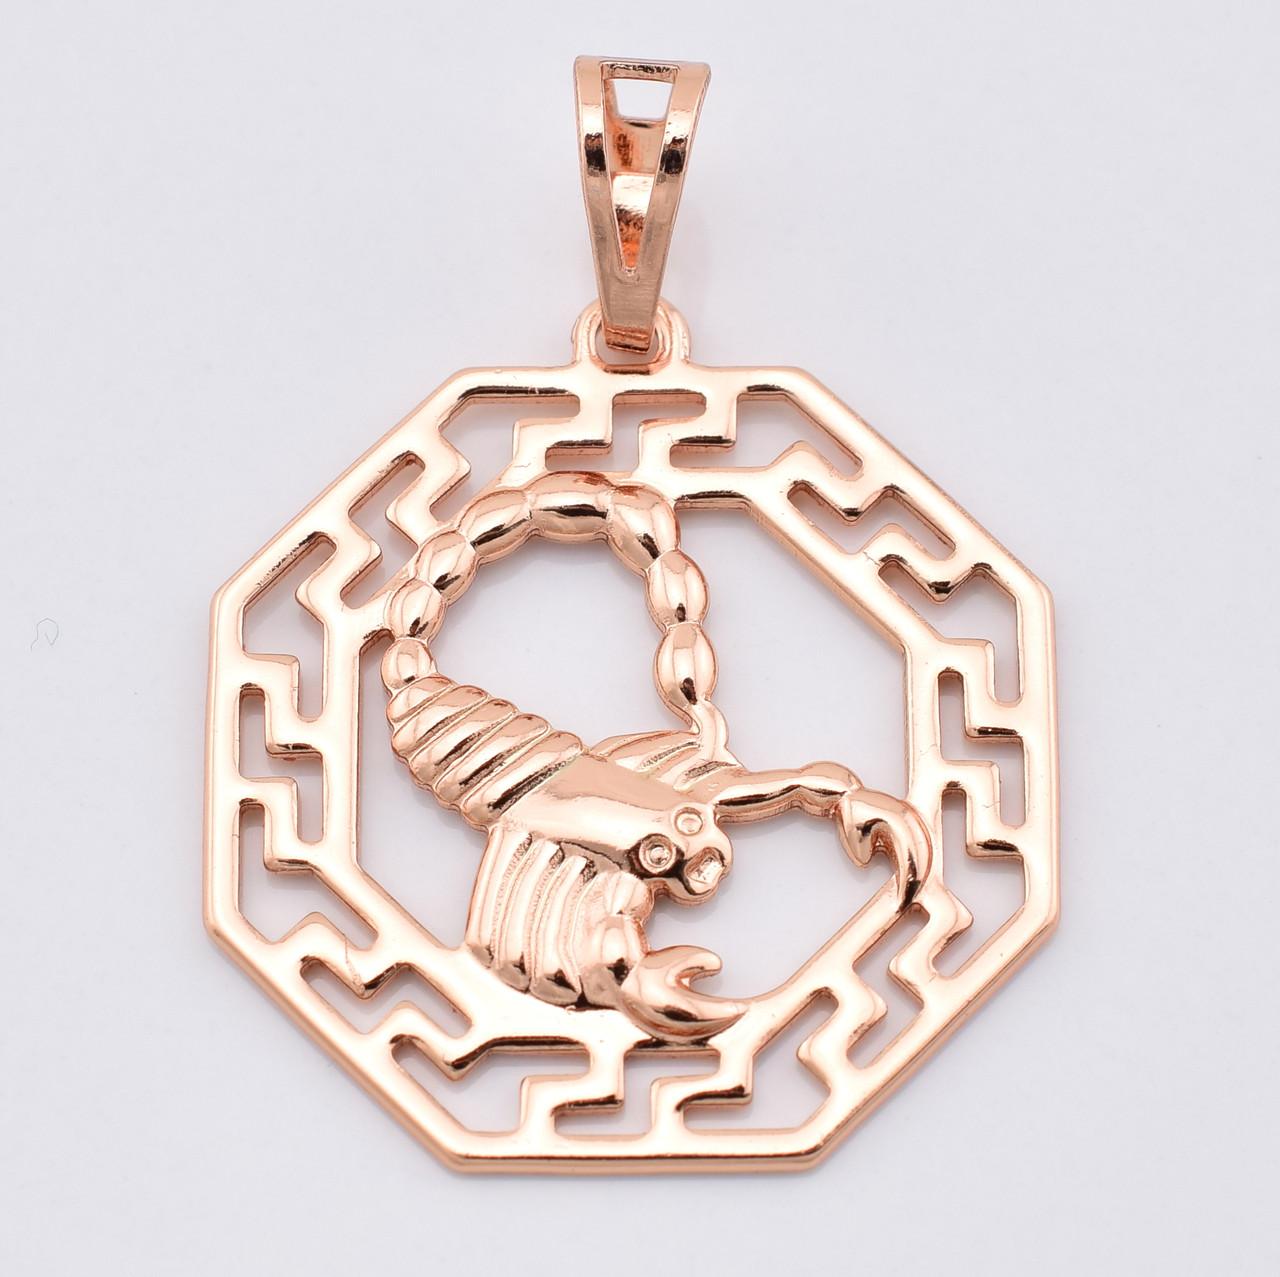 Знак зодиака 55469 Скорпион, размер 35*25 мм, позолота РО